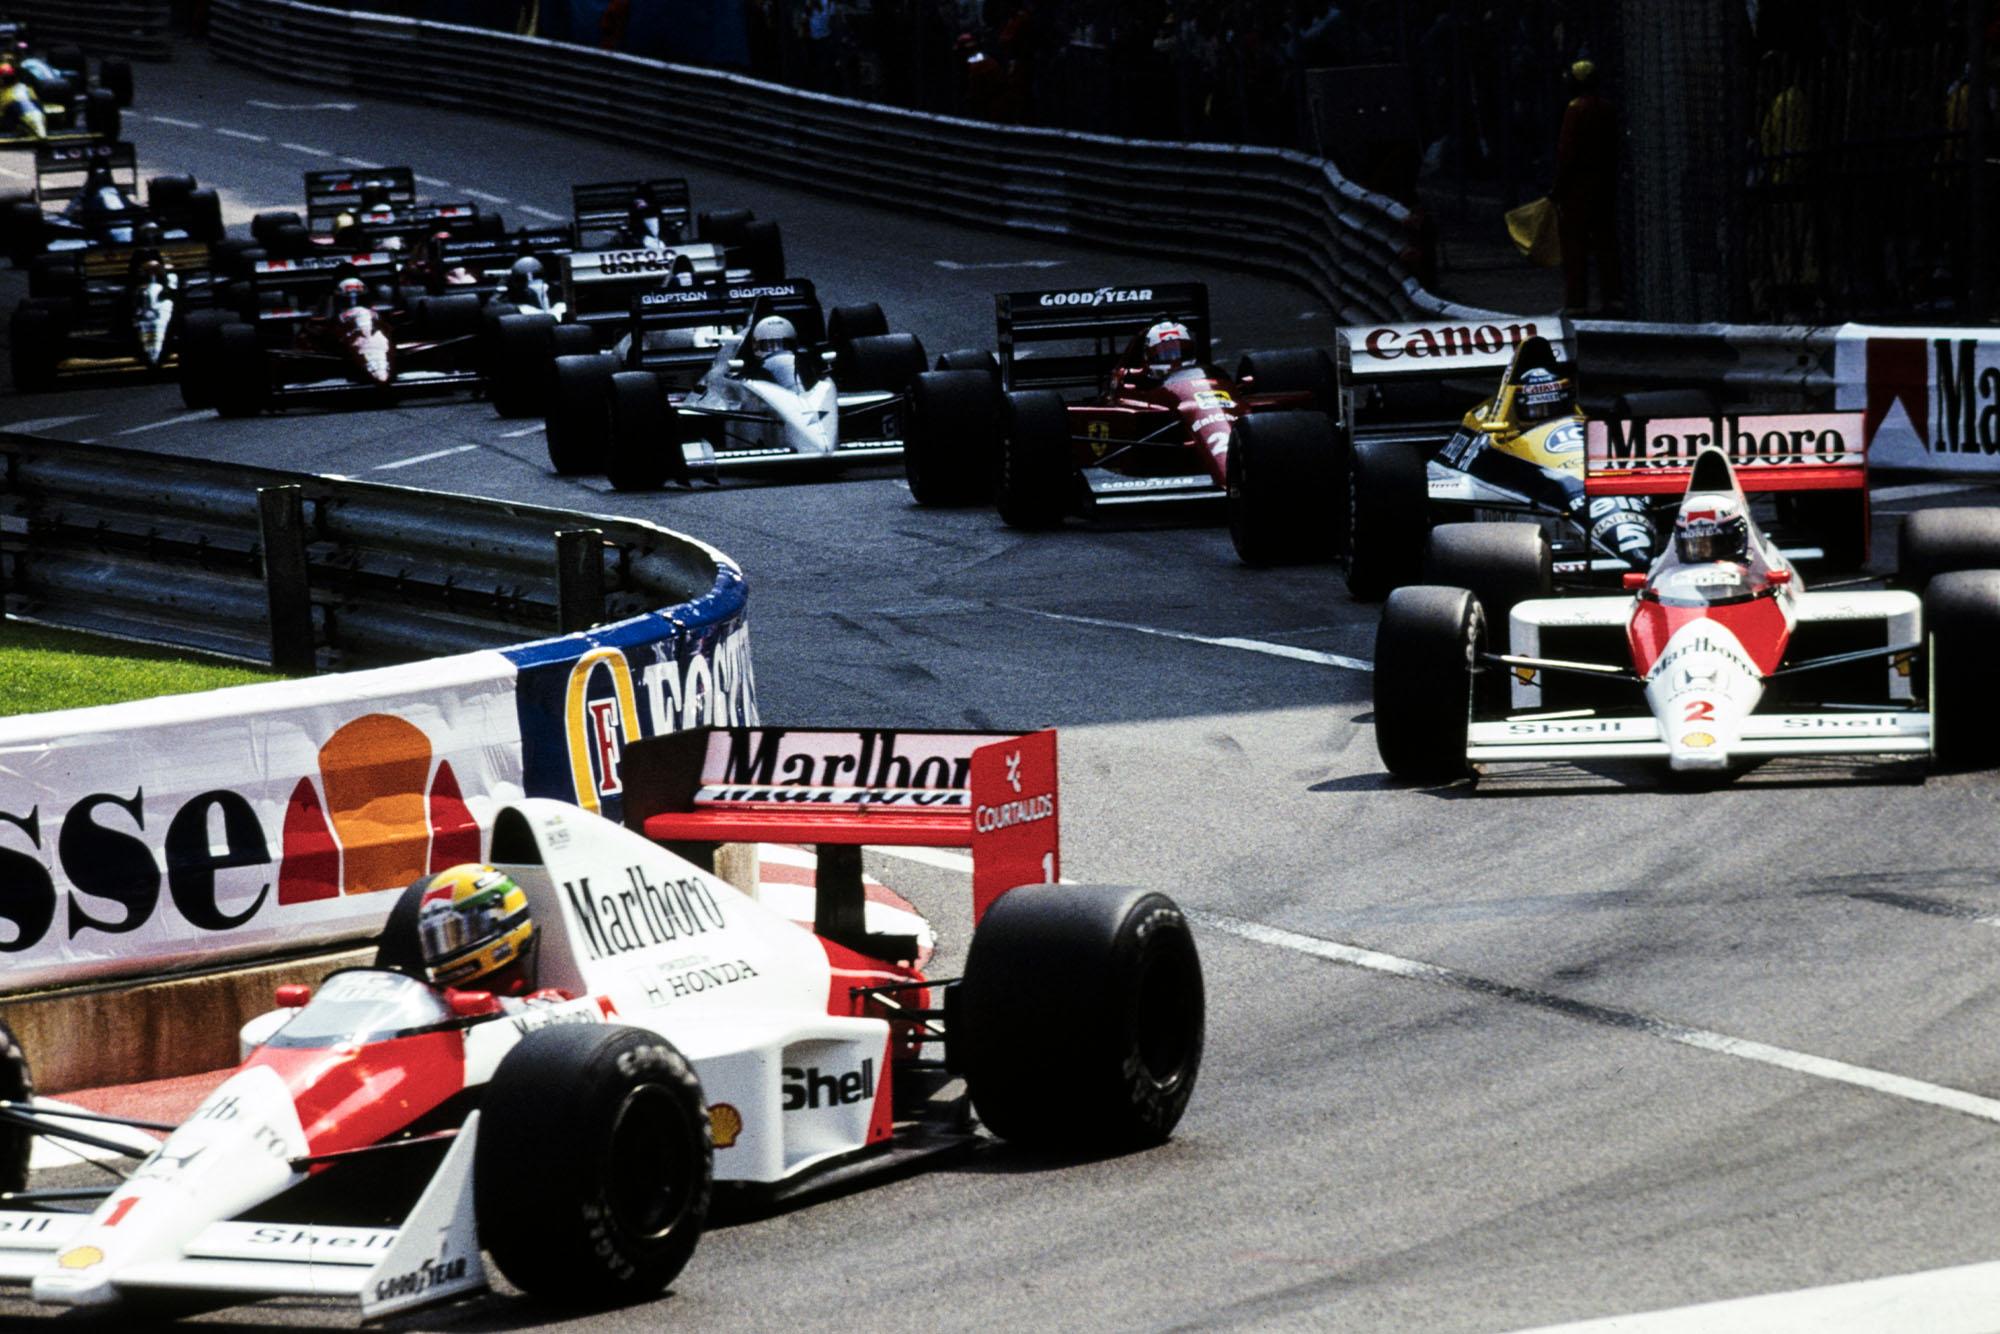 1989 Monaco GP start